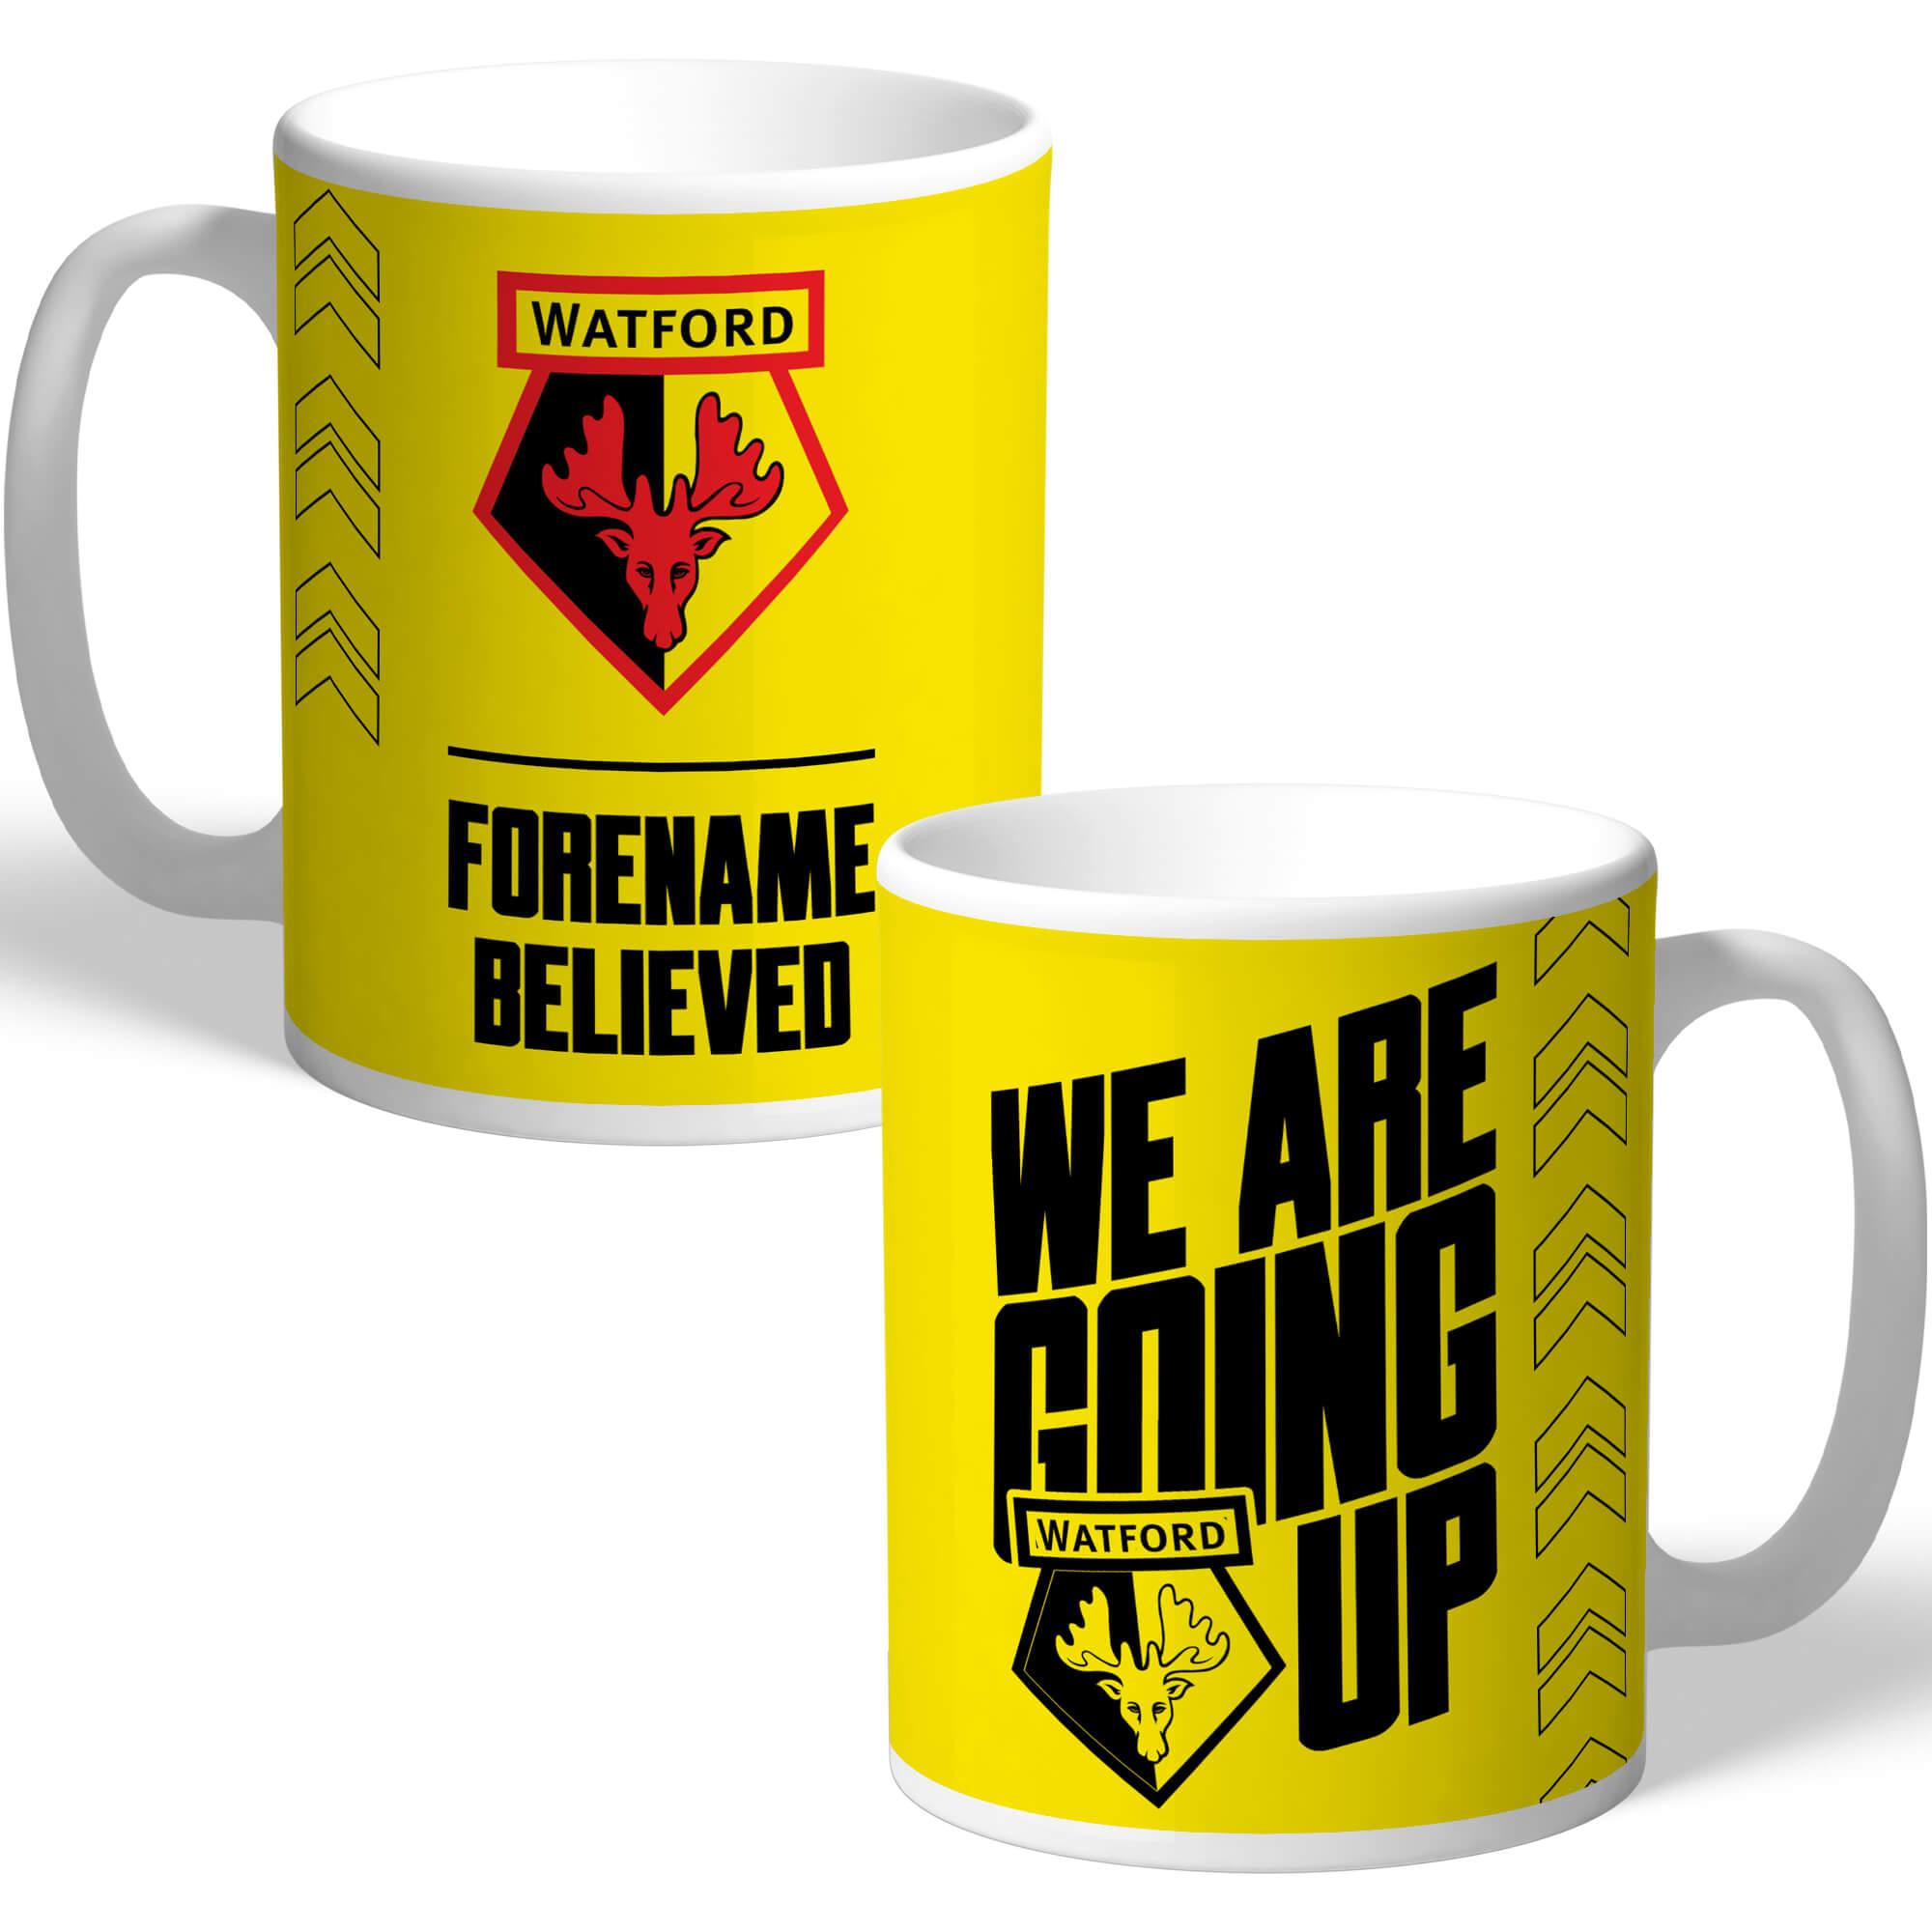 Watford FC We Are Going Up Mug